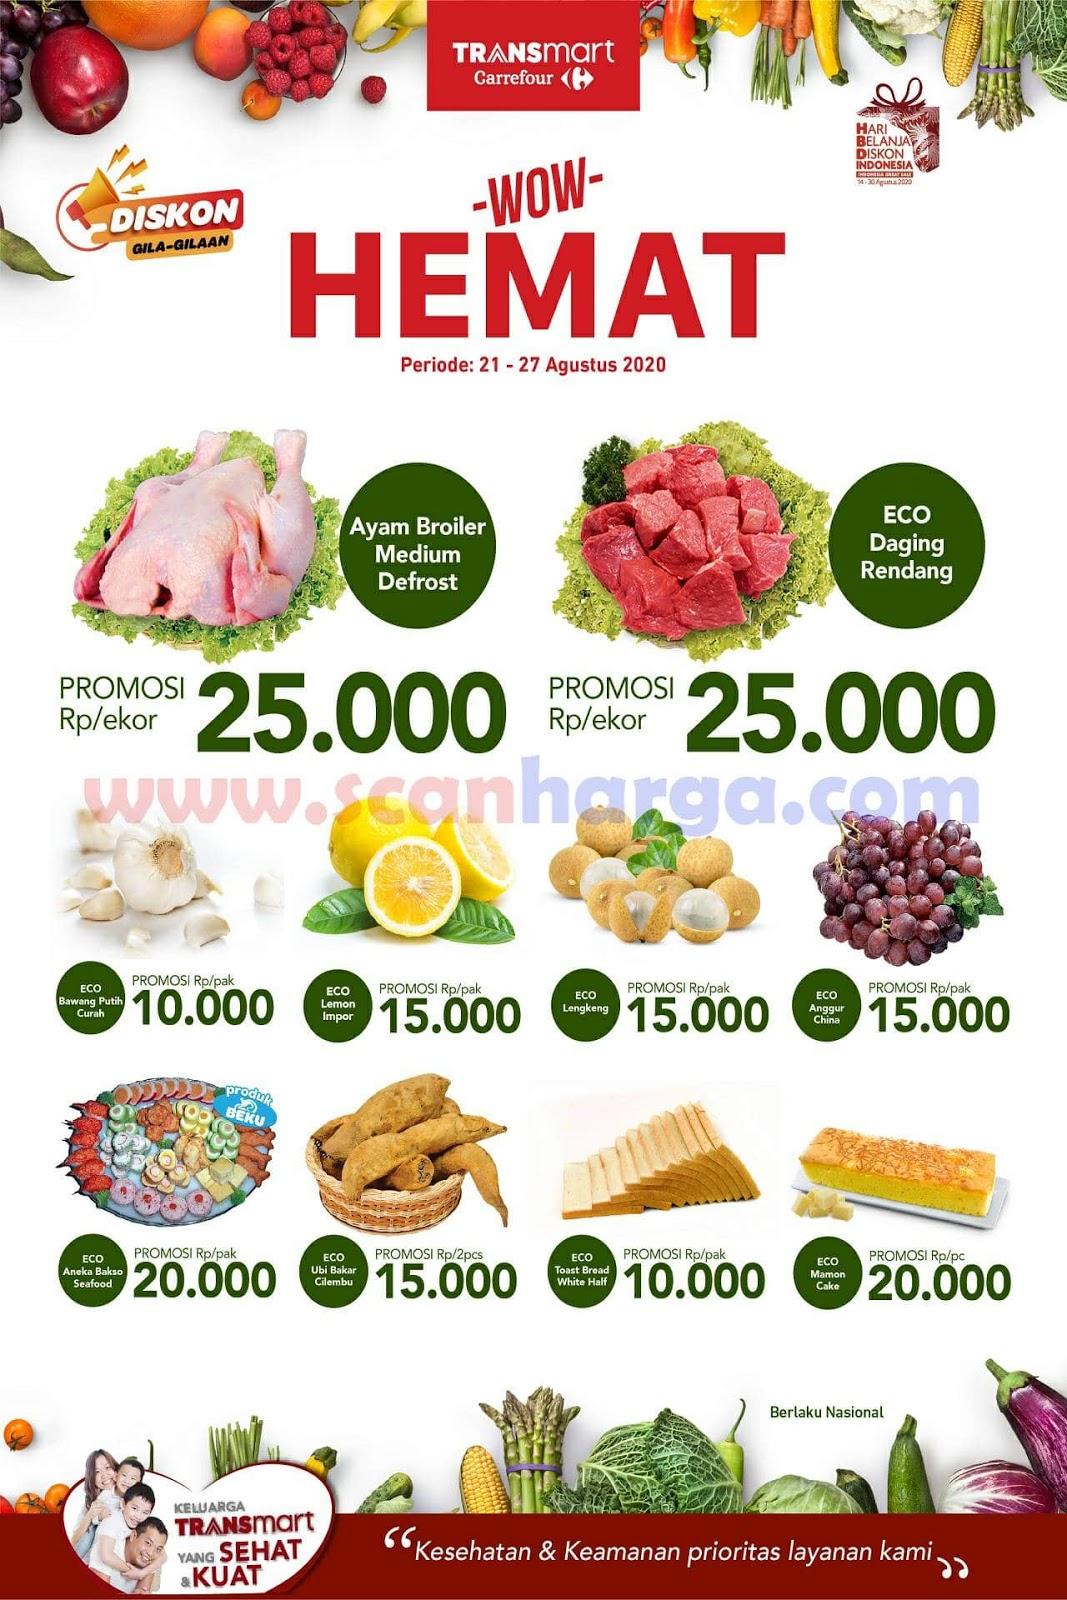 Carrefour Transmart WOW! Promo Hebat Sepekan Fresh Periode 21 - 27 Agustus 2020